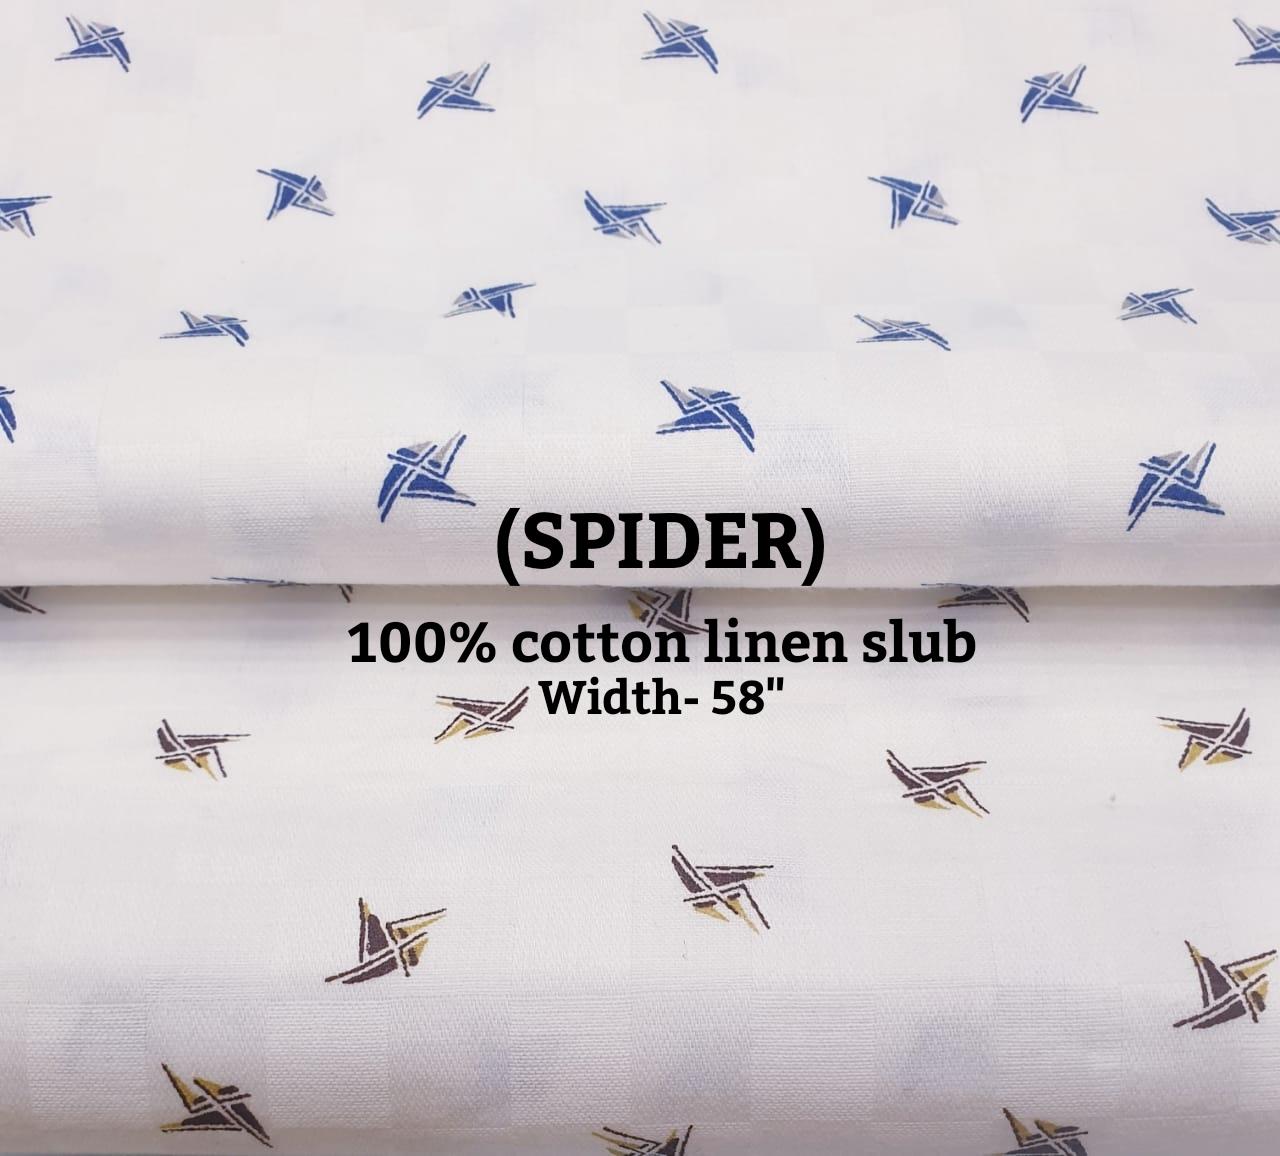 Spider 100% cotton linen slub